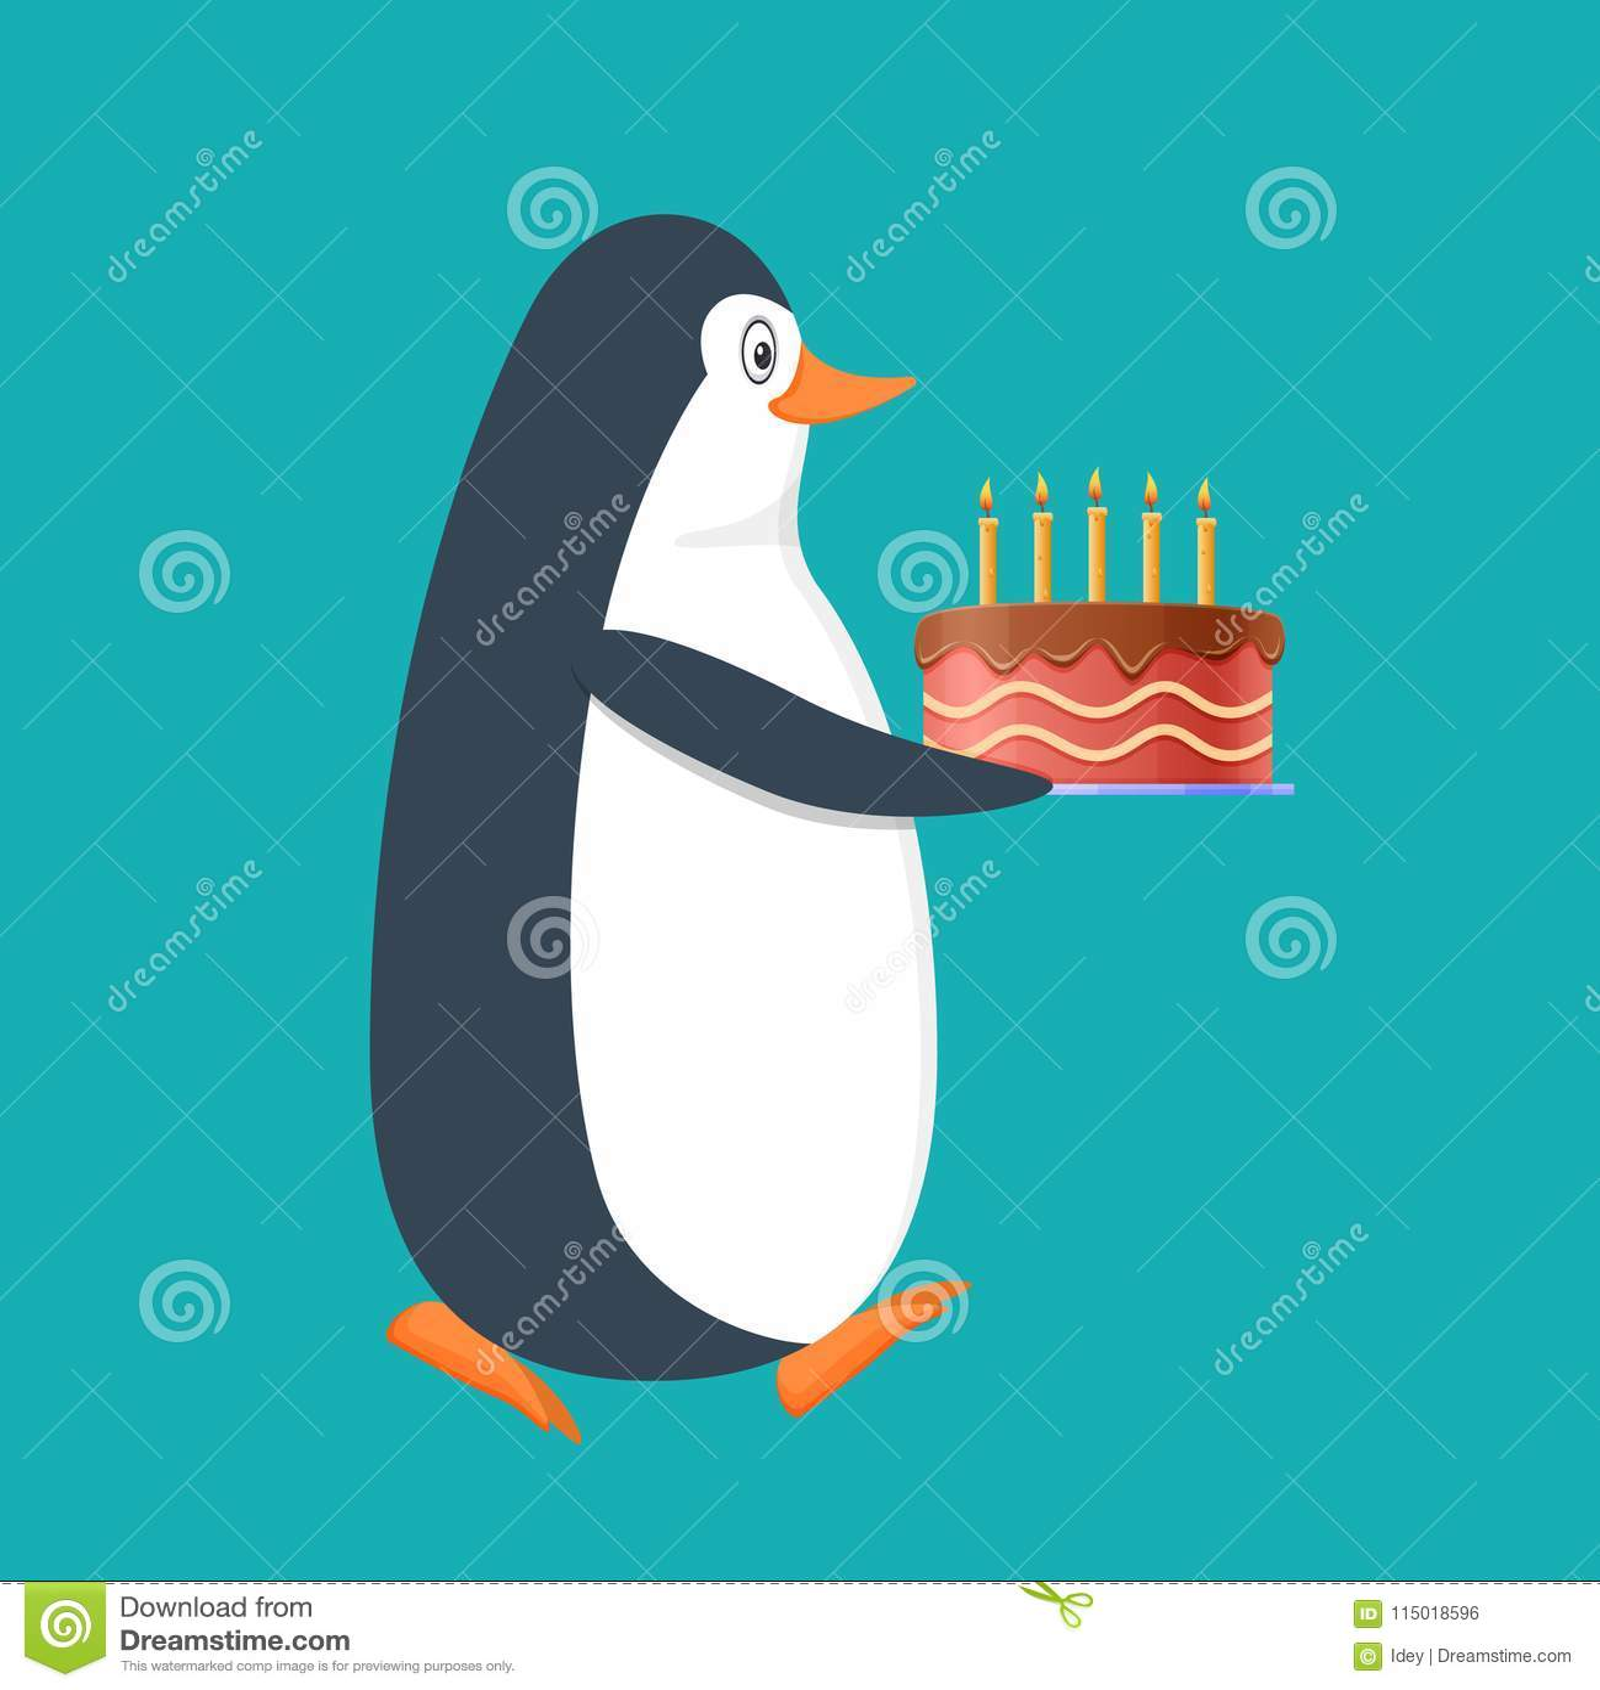 funny-penguin-antarctic-bird-large-gift-